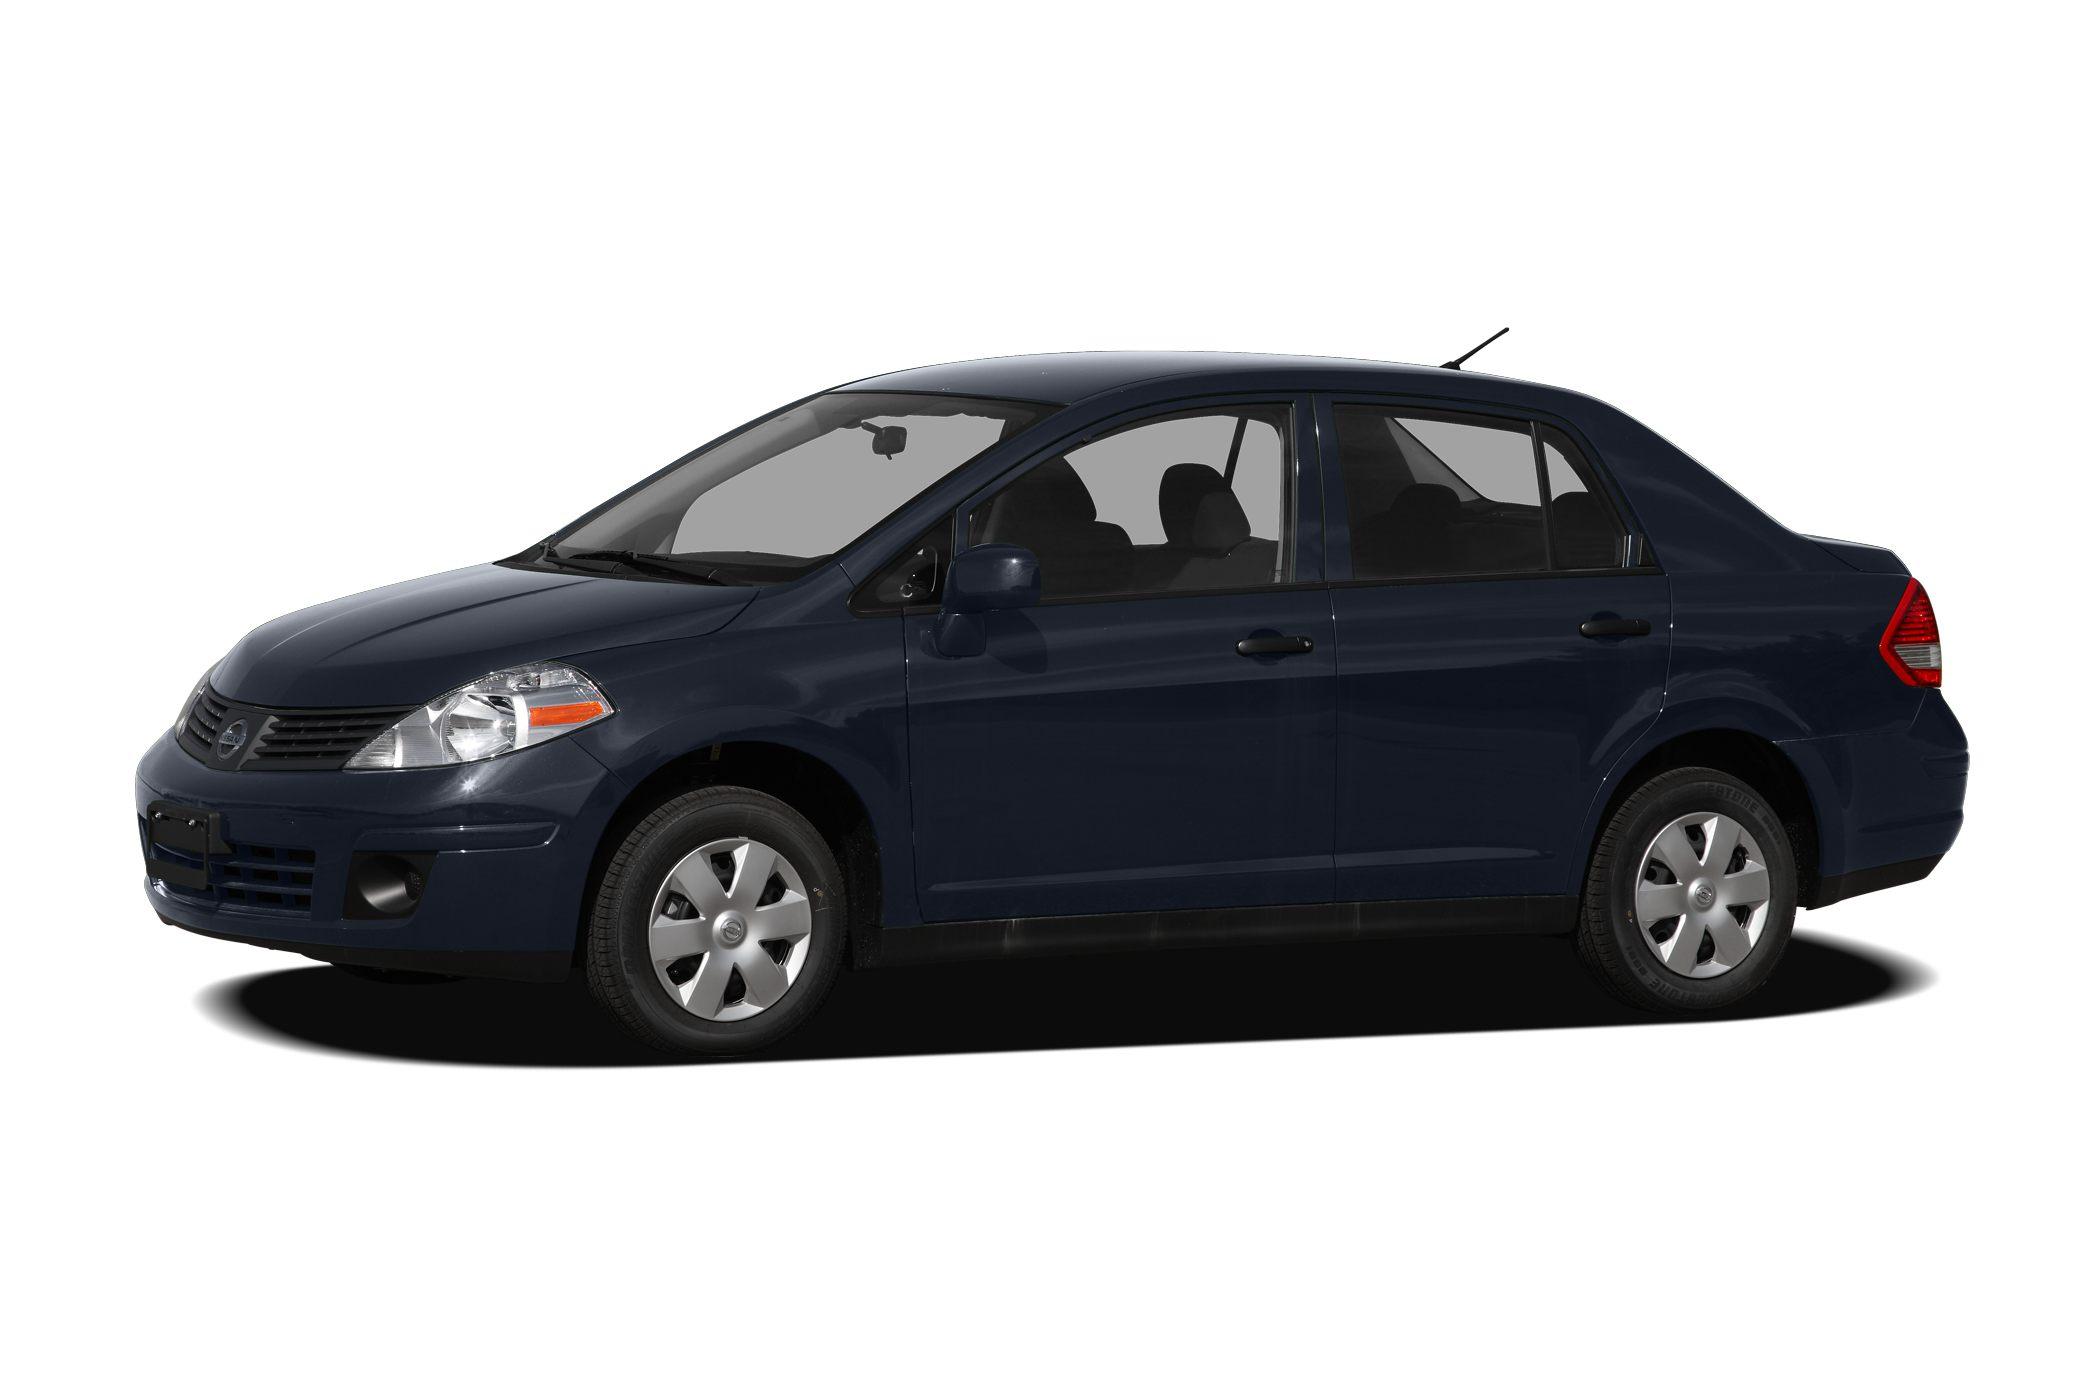 2009 Nissan Versa 1.8S 4dr Hatchback Trade In and Resale ...